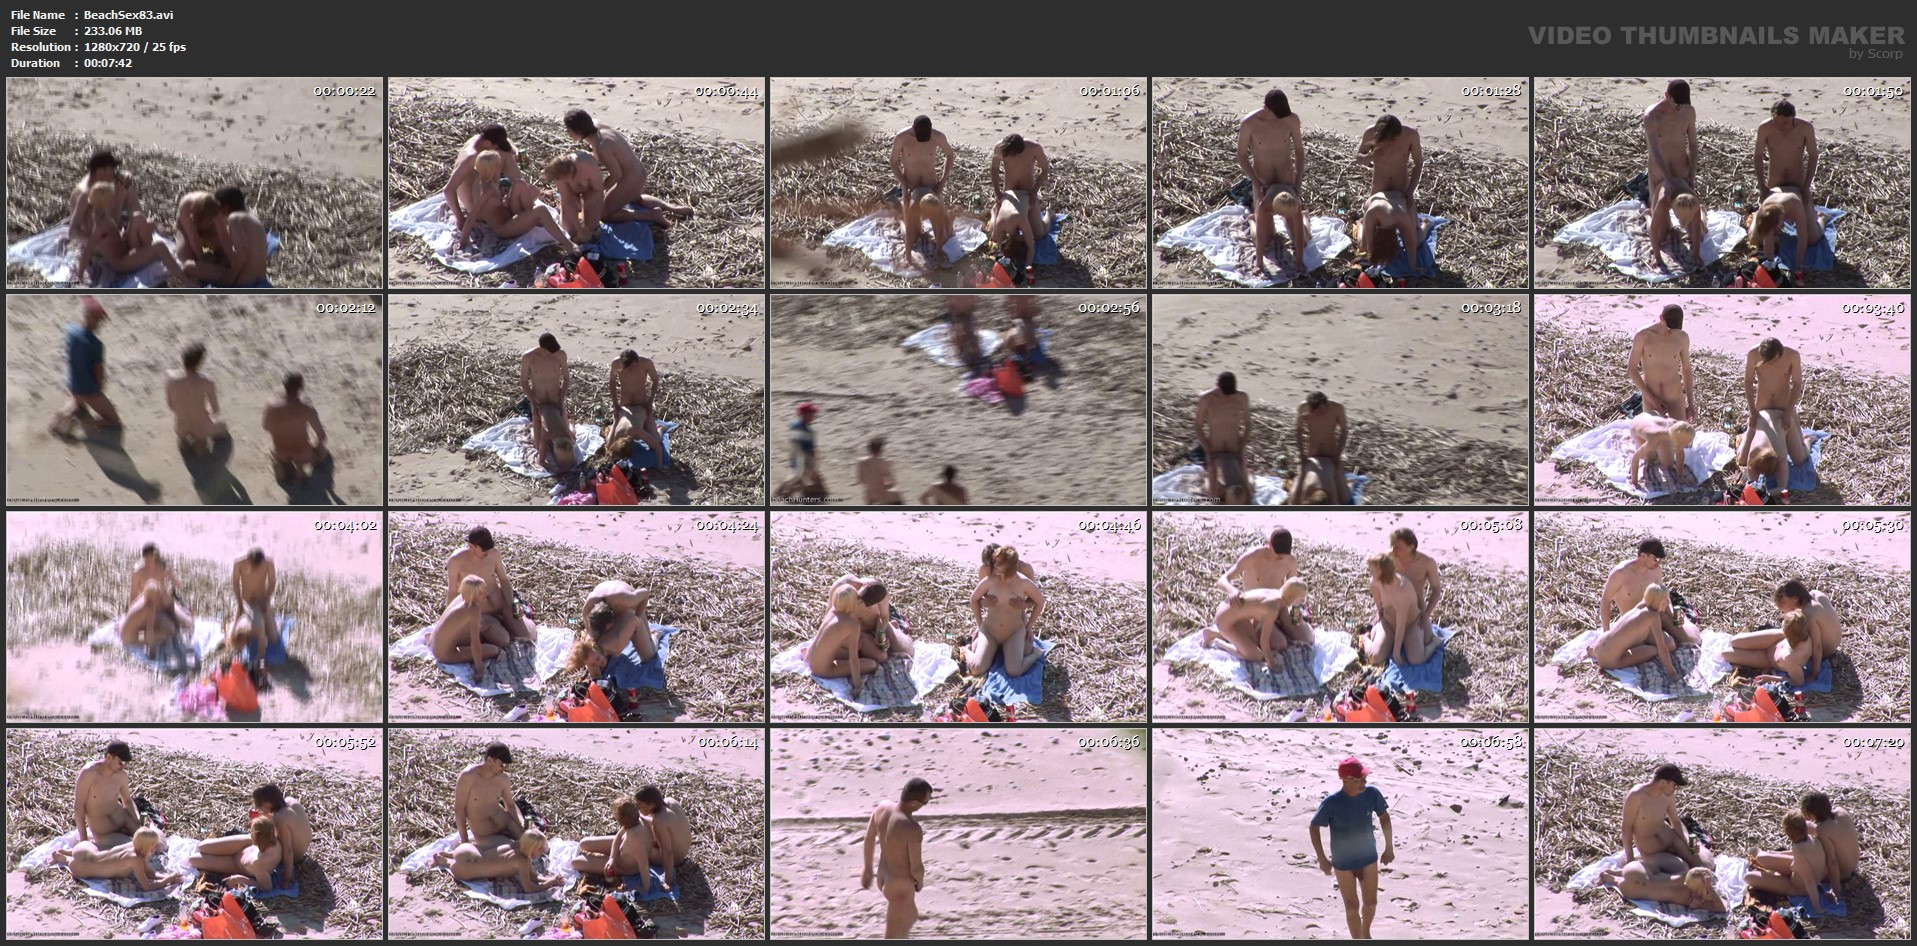 beachsex83-avi